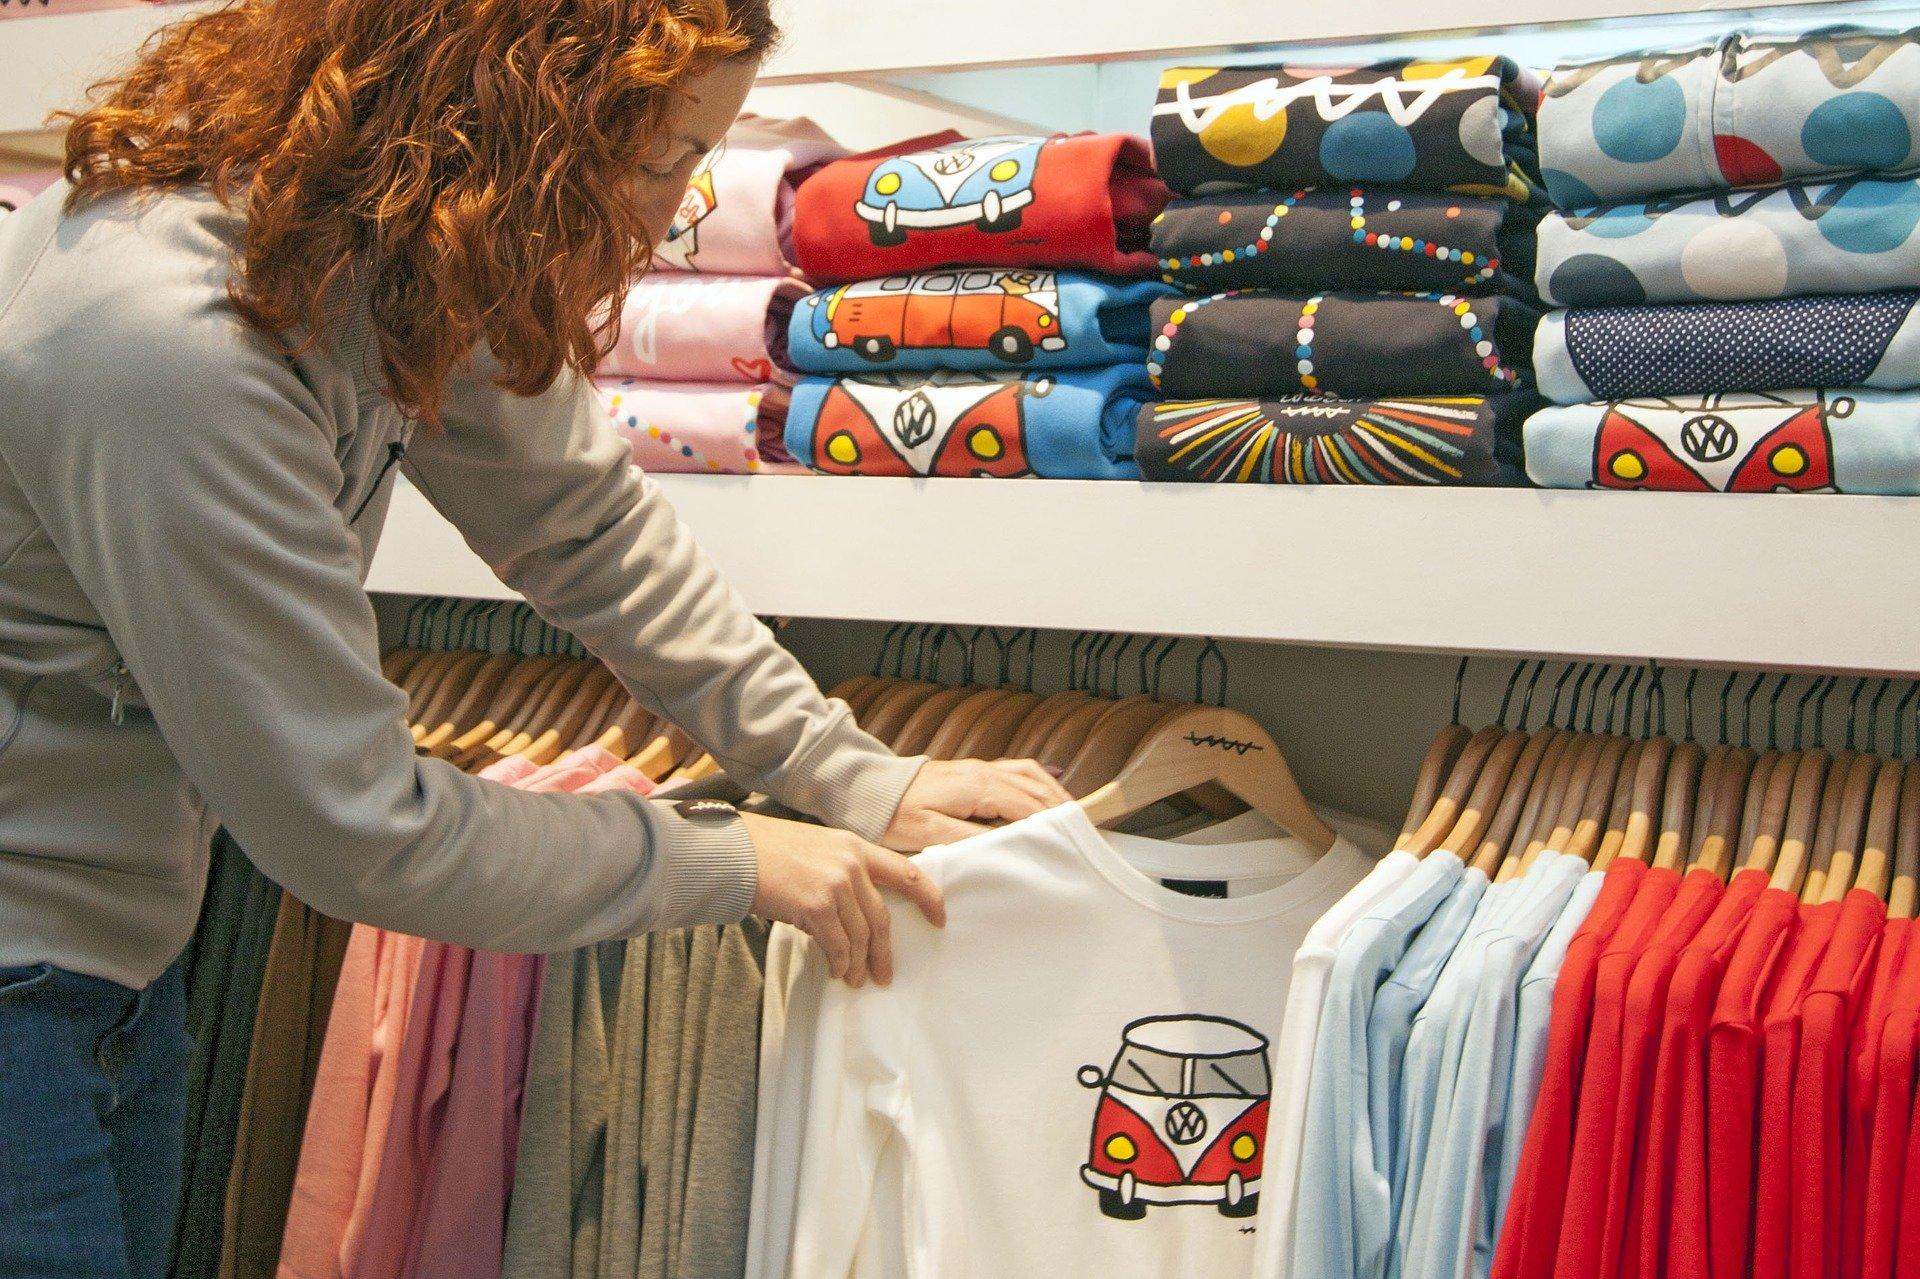 Sitodruk na ubraniach – charakterystyka i zastosowanie